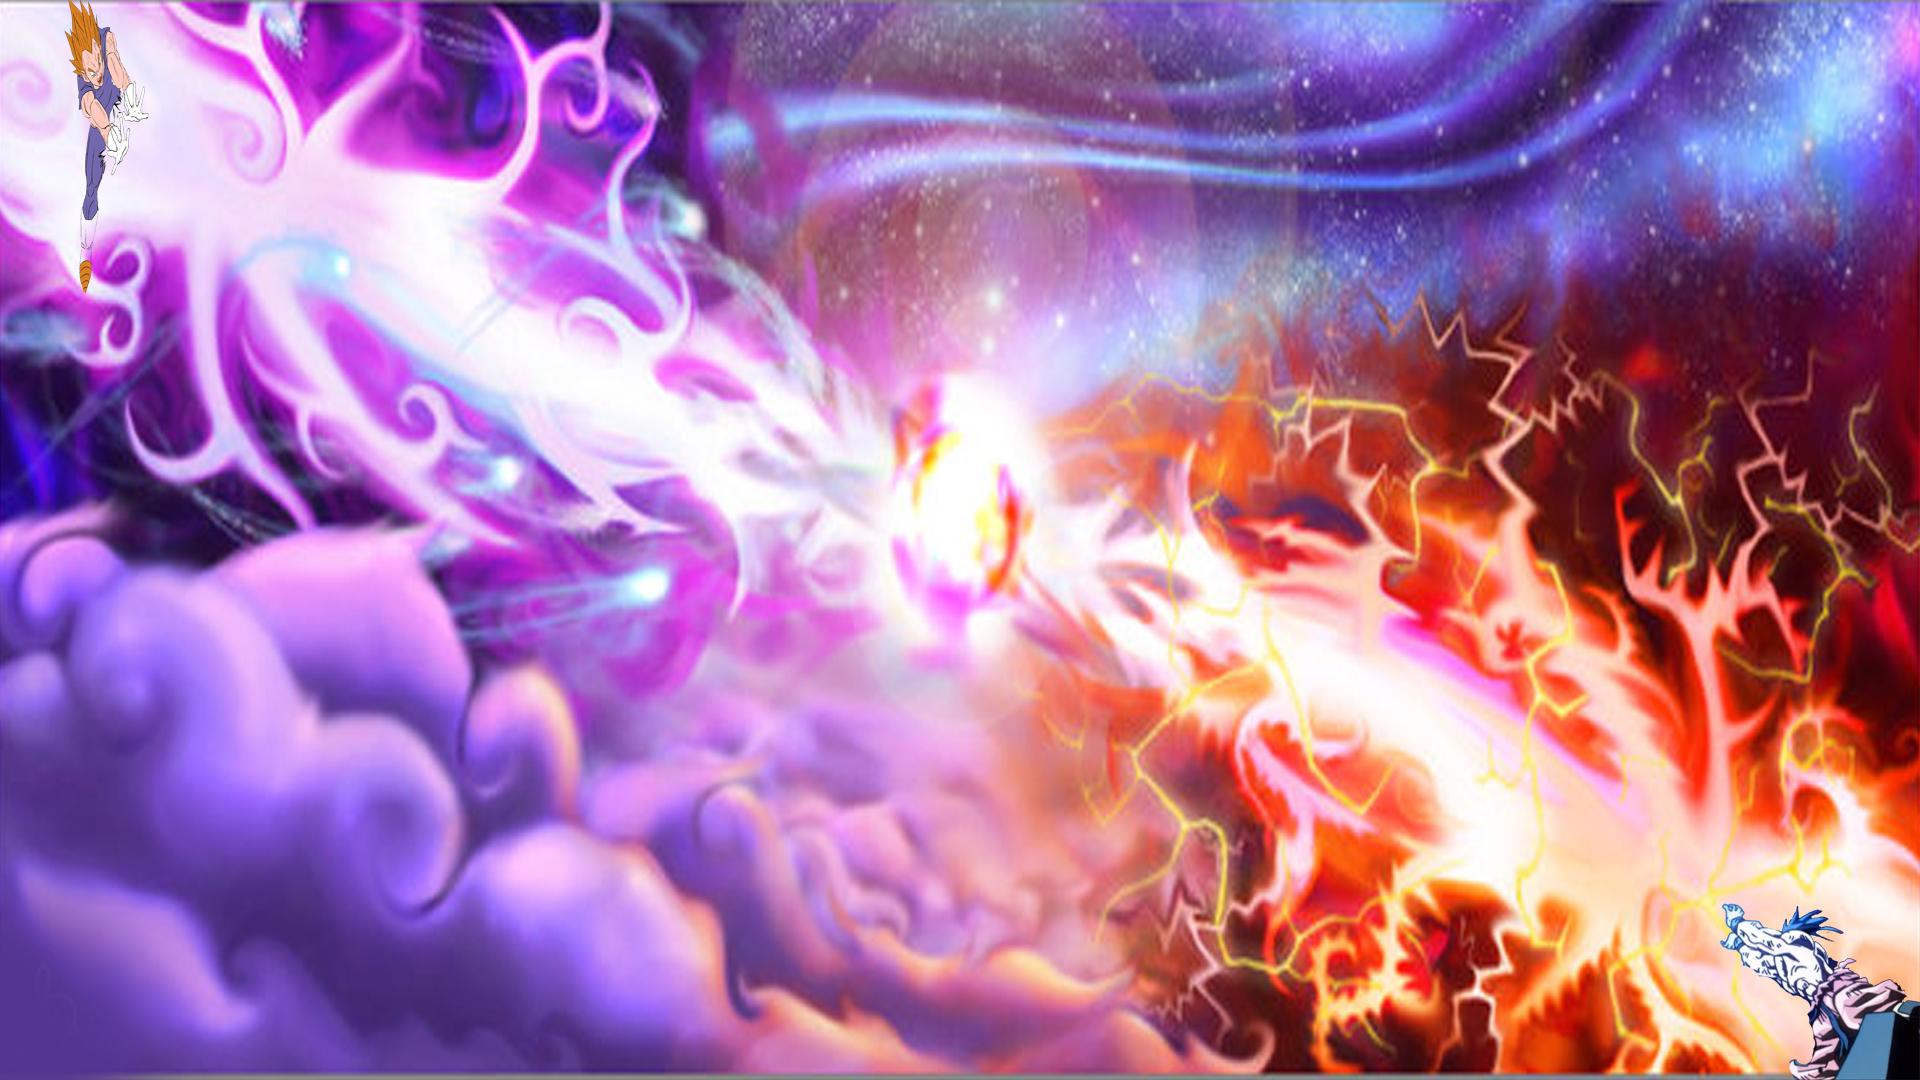 Epic Dragon Ball Z Wallpaper Posted By Ryan Thompson